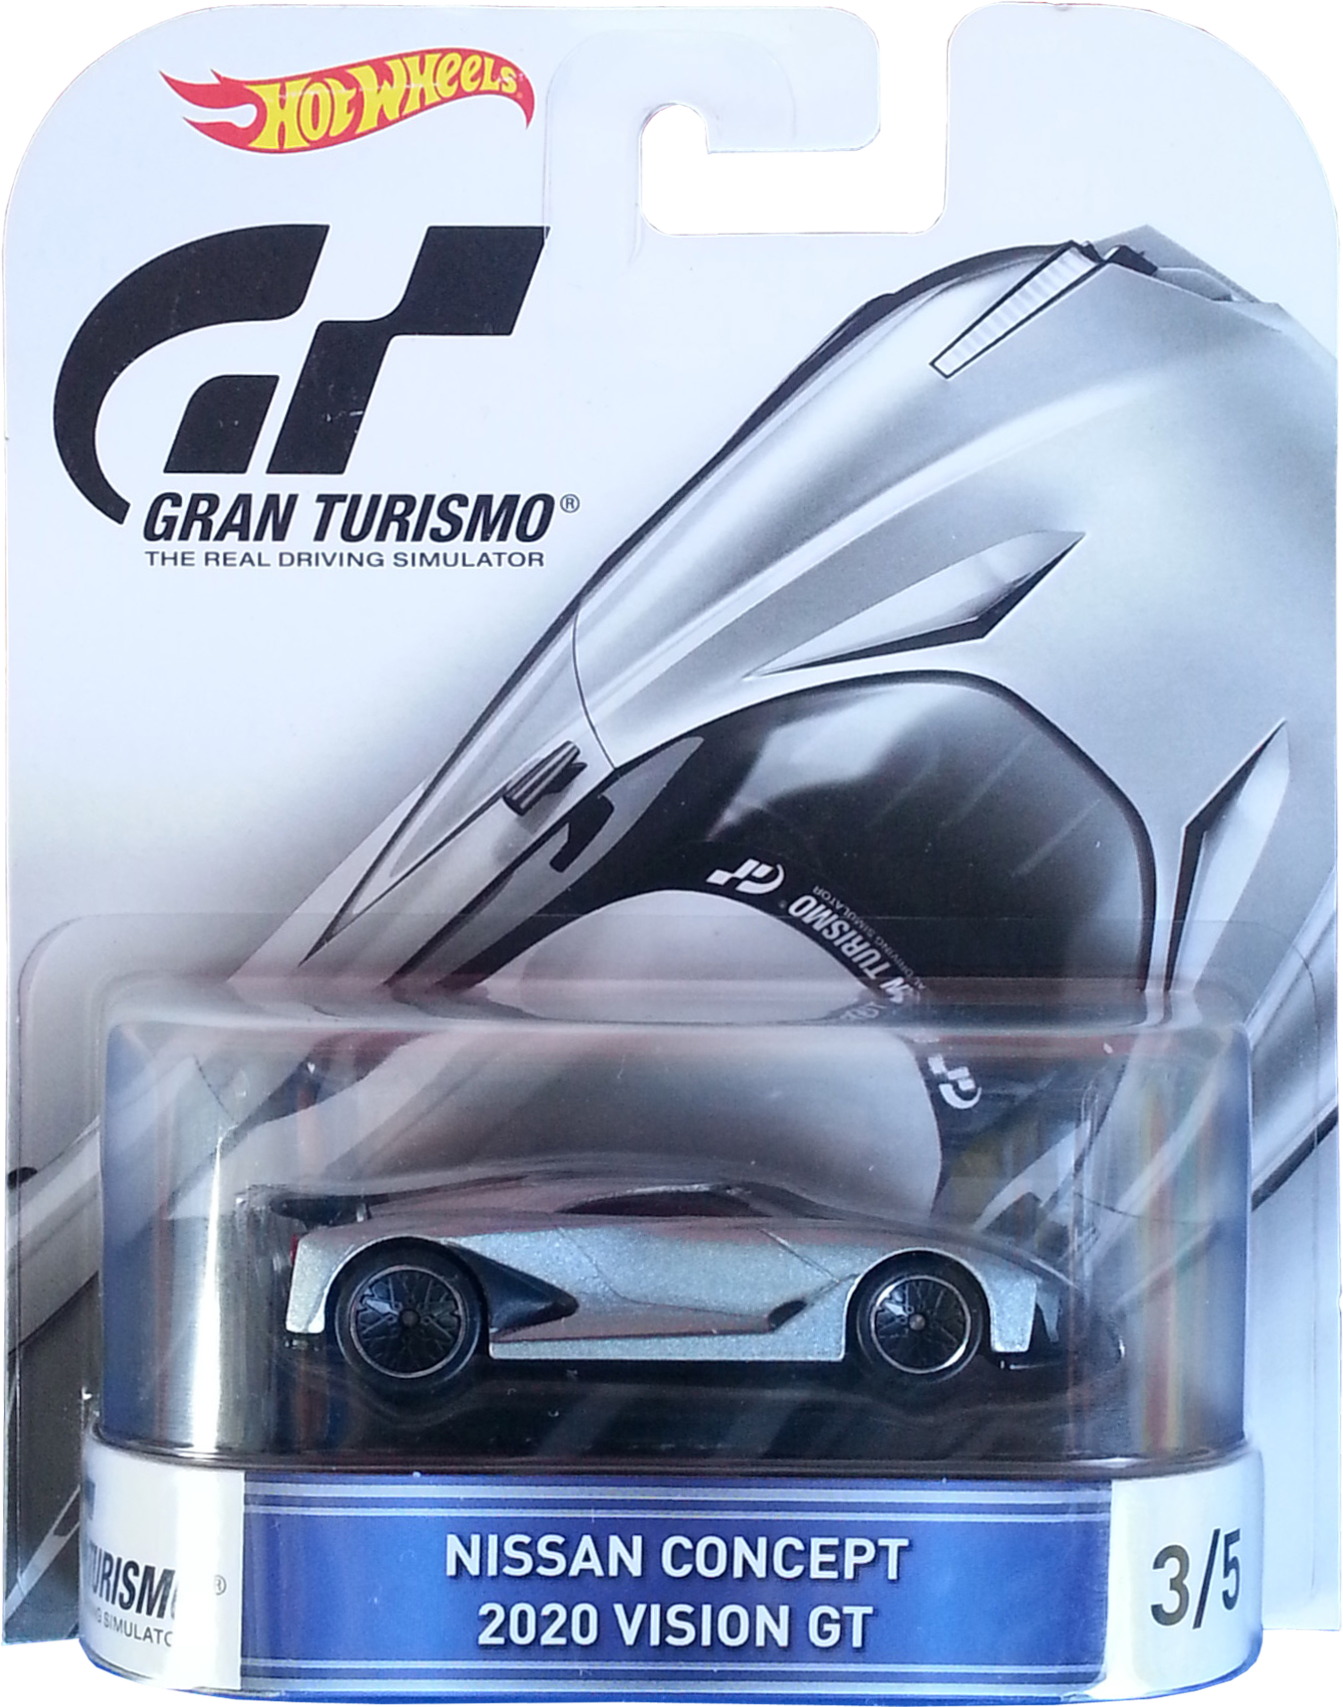 Nissan Concept 2020 Vision GT | Hot Wheels Wiki | FANDOM ...